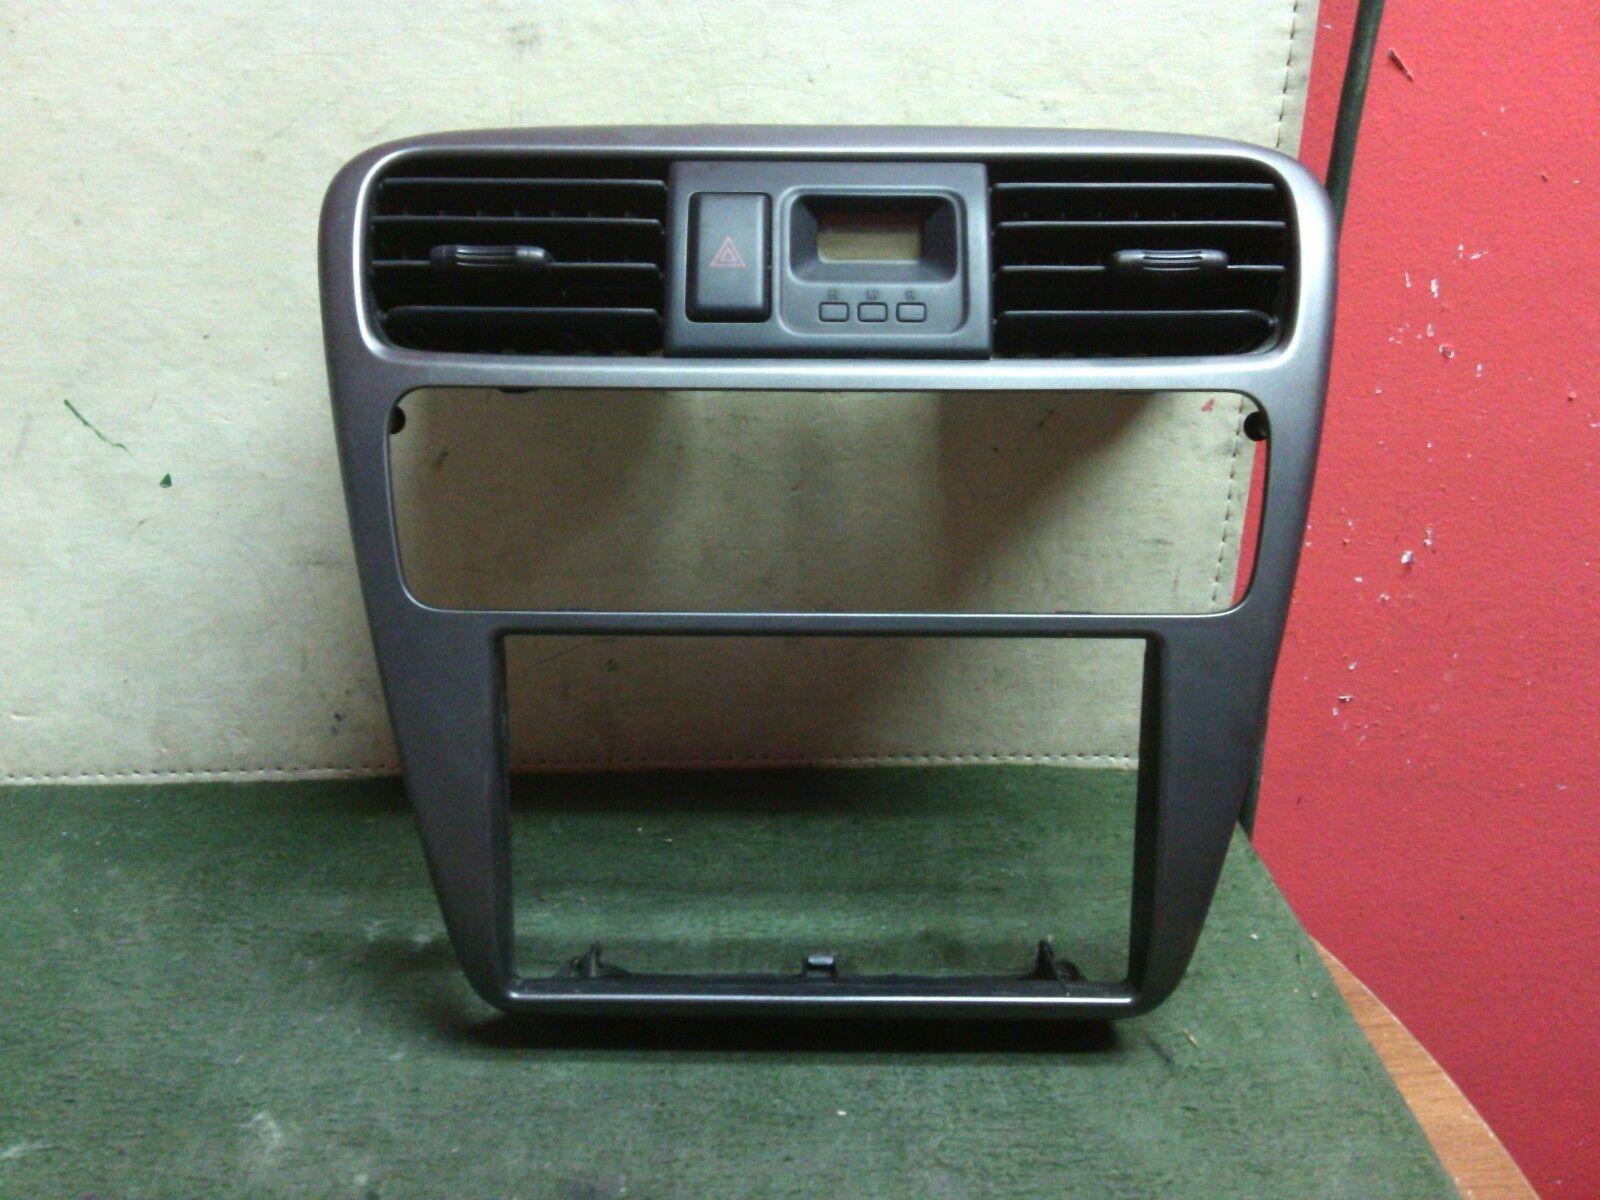 Used 2001 Honda Accord Dash Parts For Sale Stereo Code Two Door Radio Bezel Oem Dark Gray